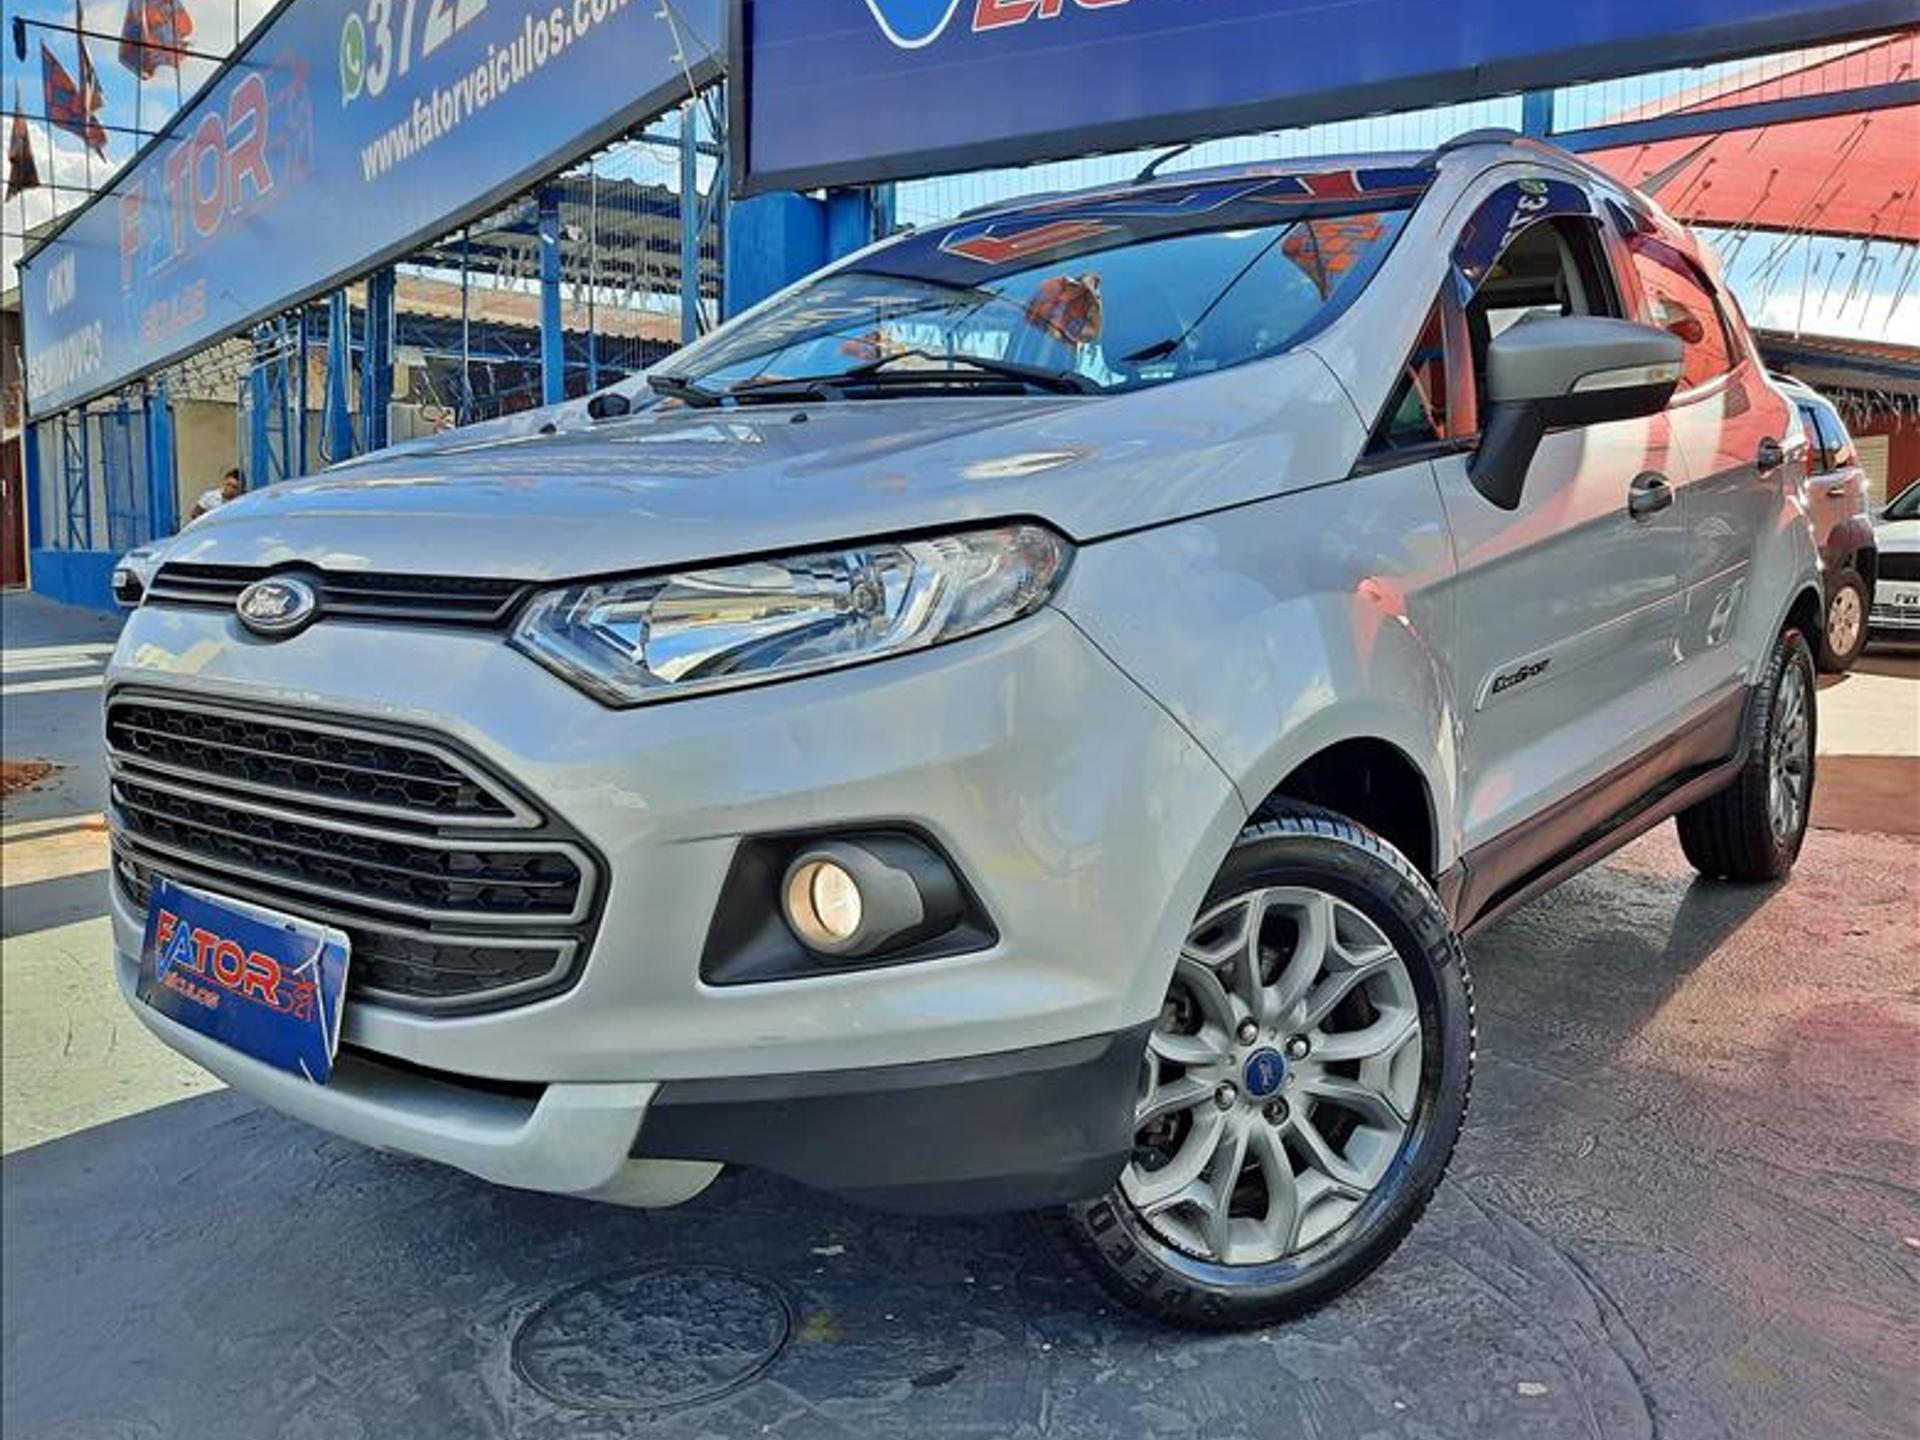 Ford Ecosport 1.6 Freestyle 16v Flex 4p Manual Wmimagem14290723875